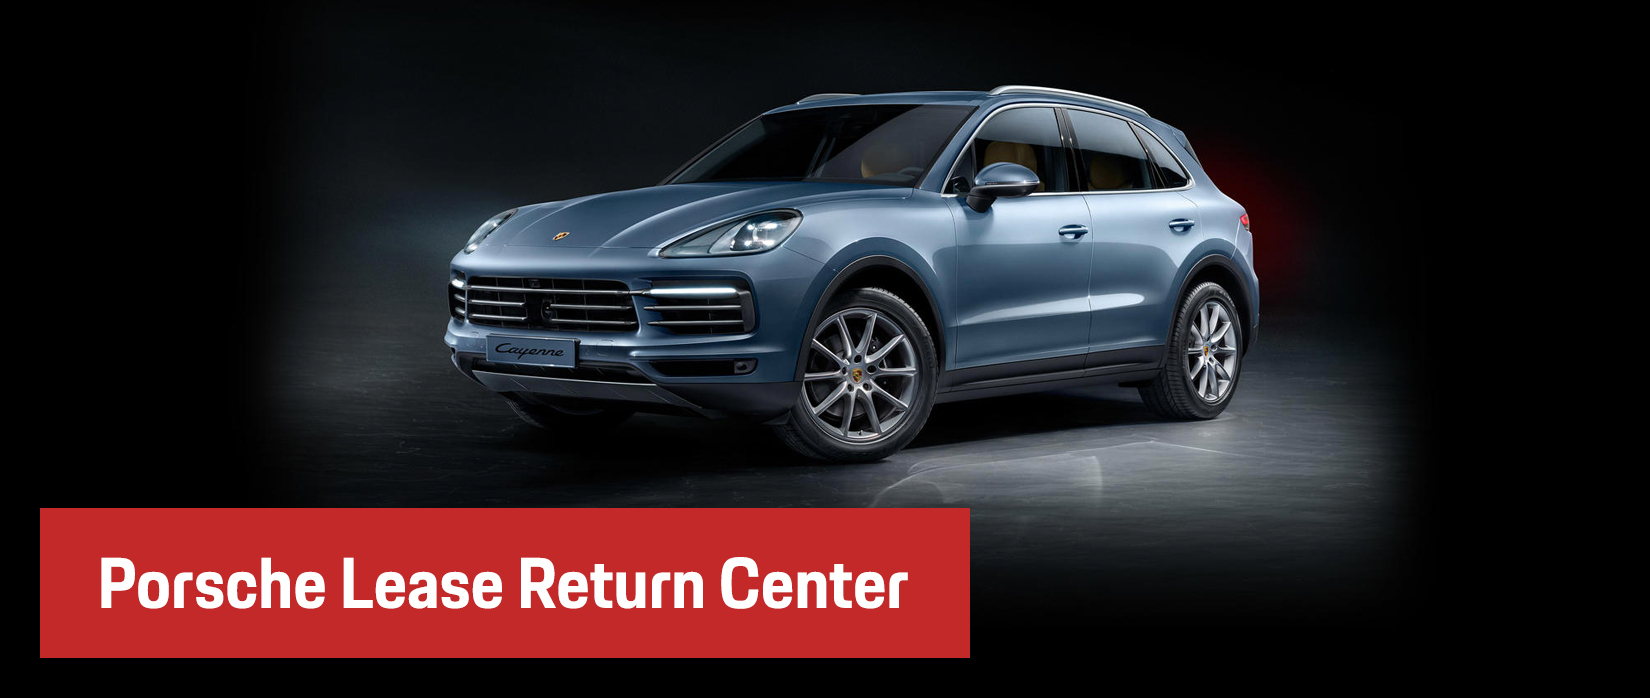 Porsche Lease Return Center in Ontario